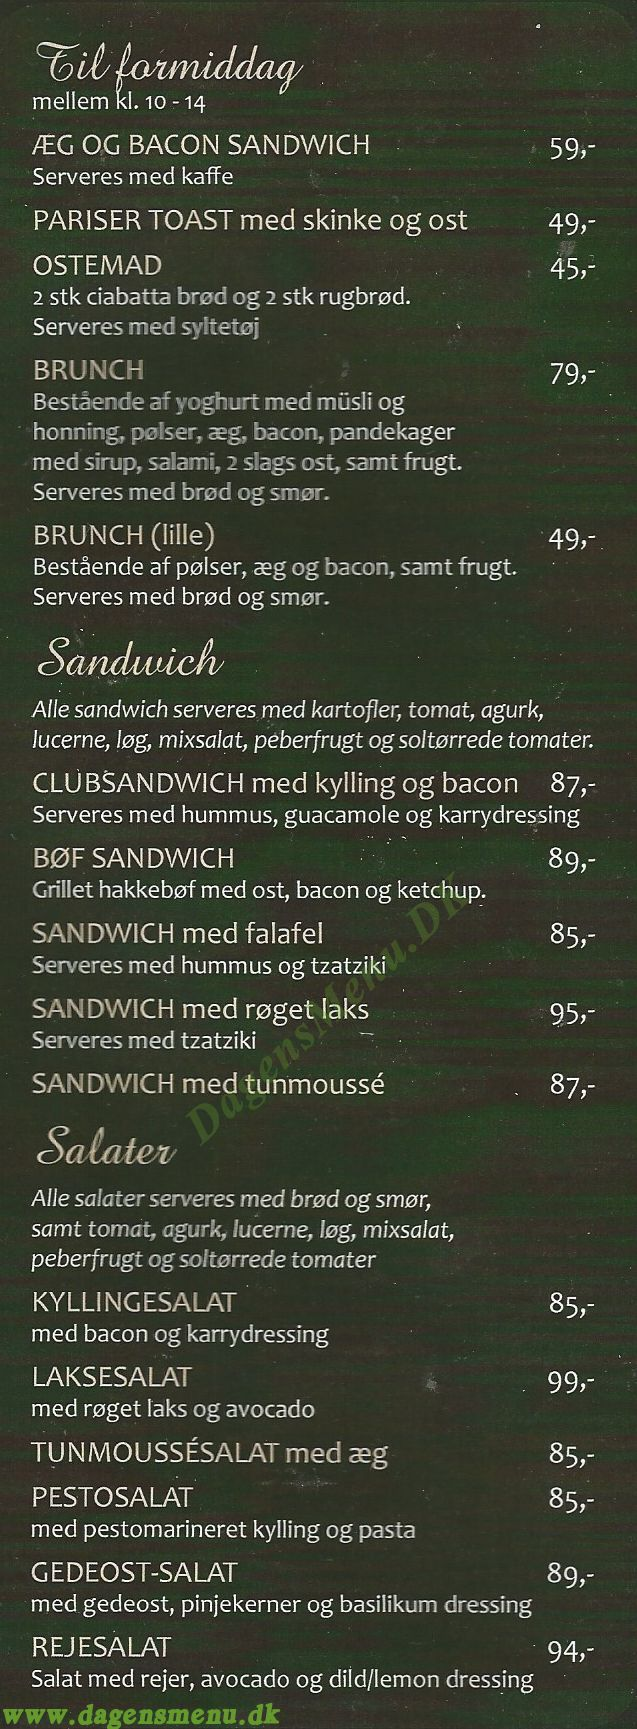 Cafe Liyana - Menukort